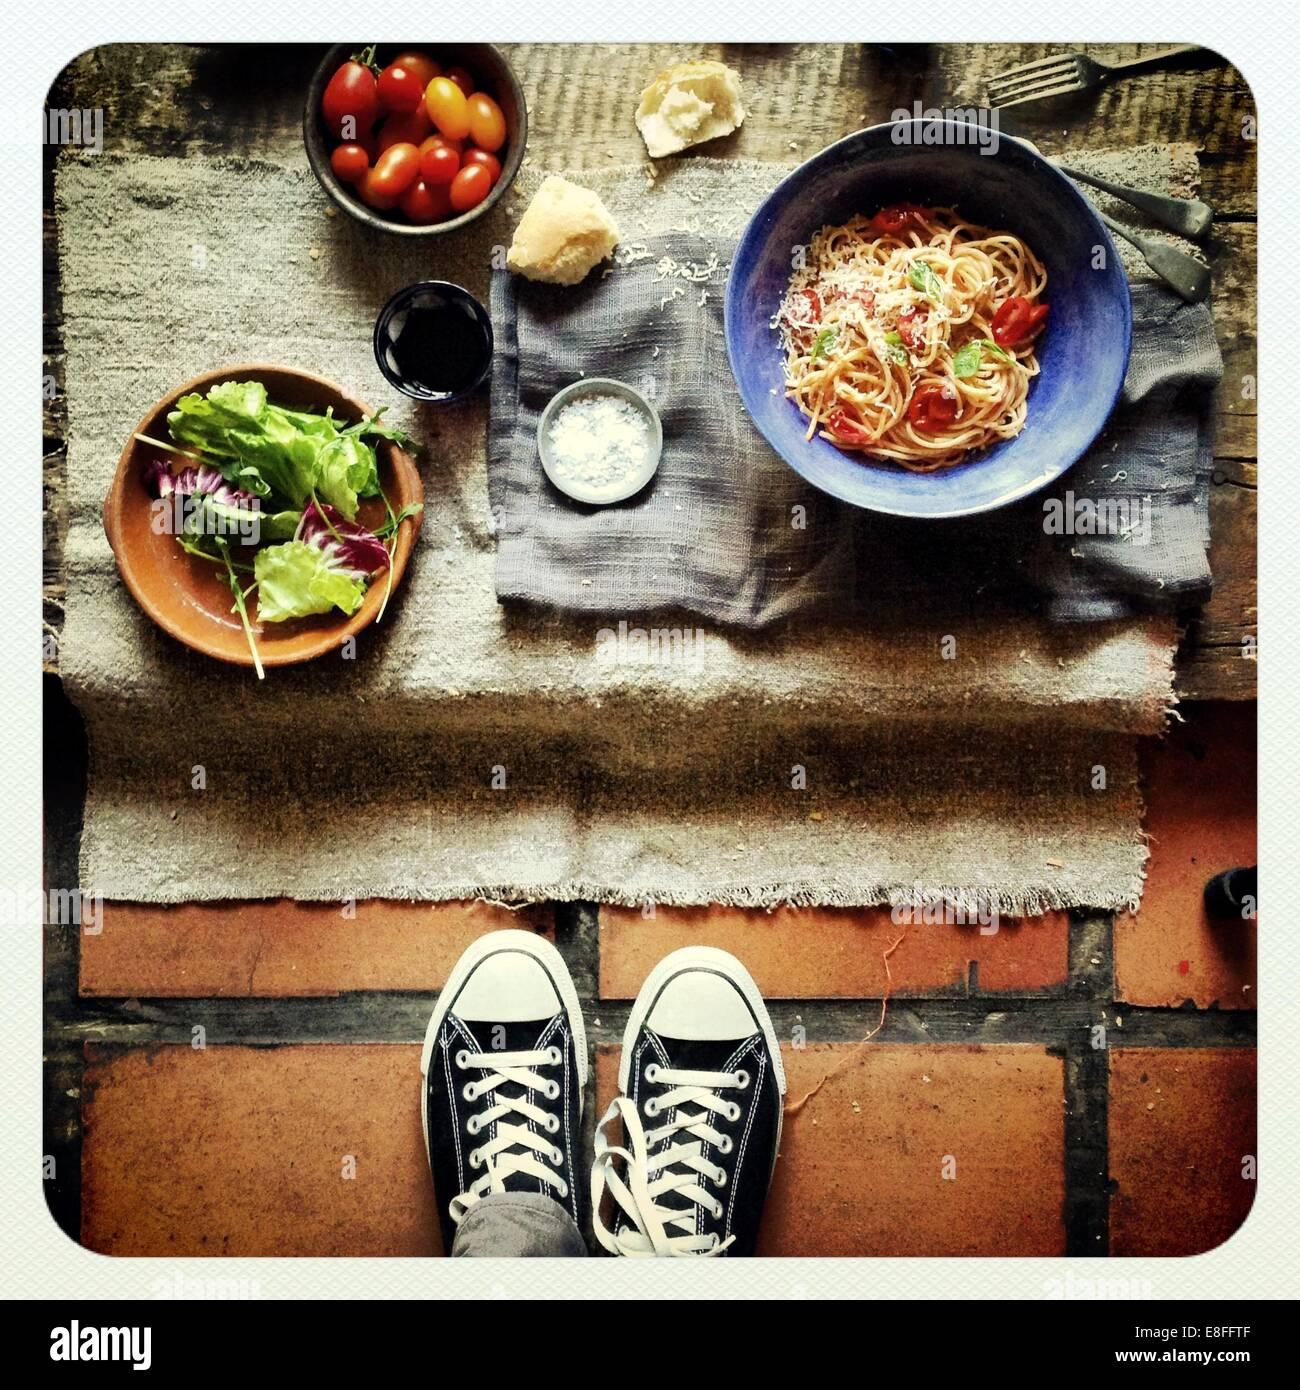 Photographier l'alimentation Photo Stock